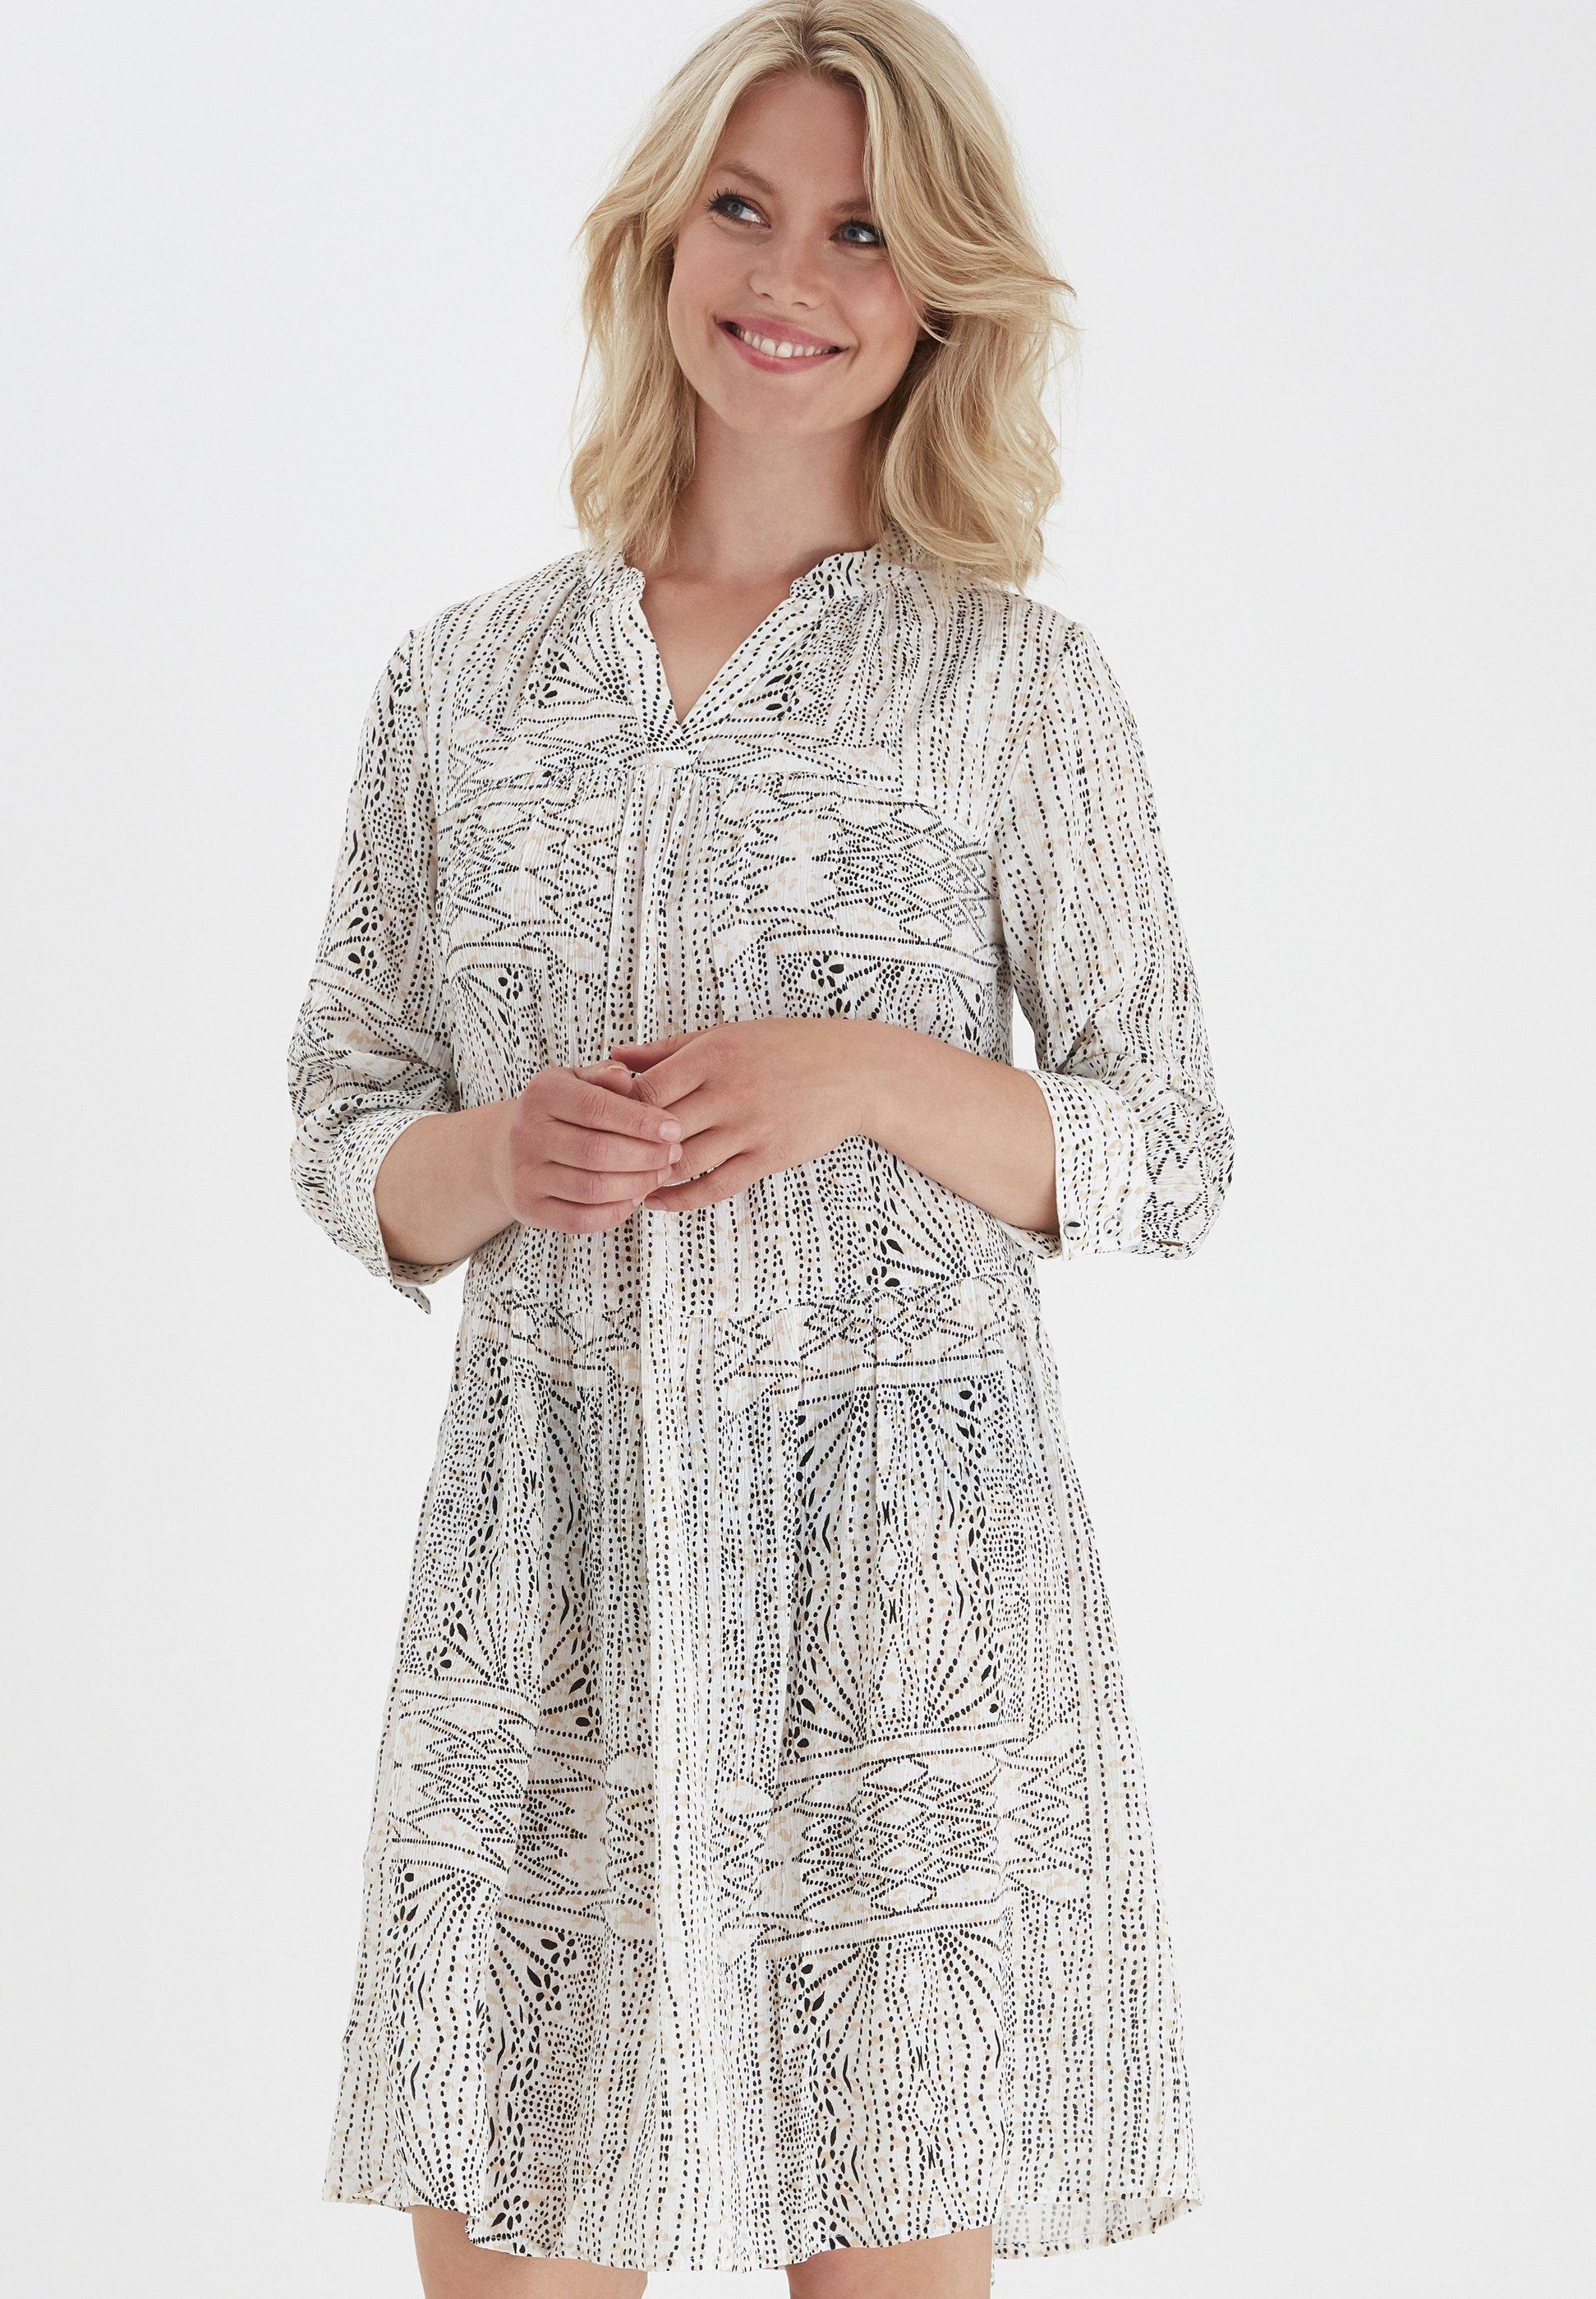 Bulk Designs Perfect Women's Clothing Fransa FRLASOFTY  Day dress antique mix 3Yb1ck9Ta 2ECORvfoD